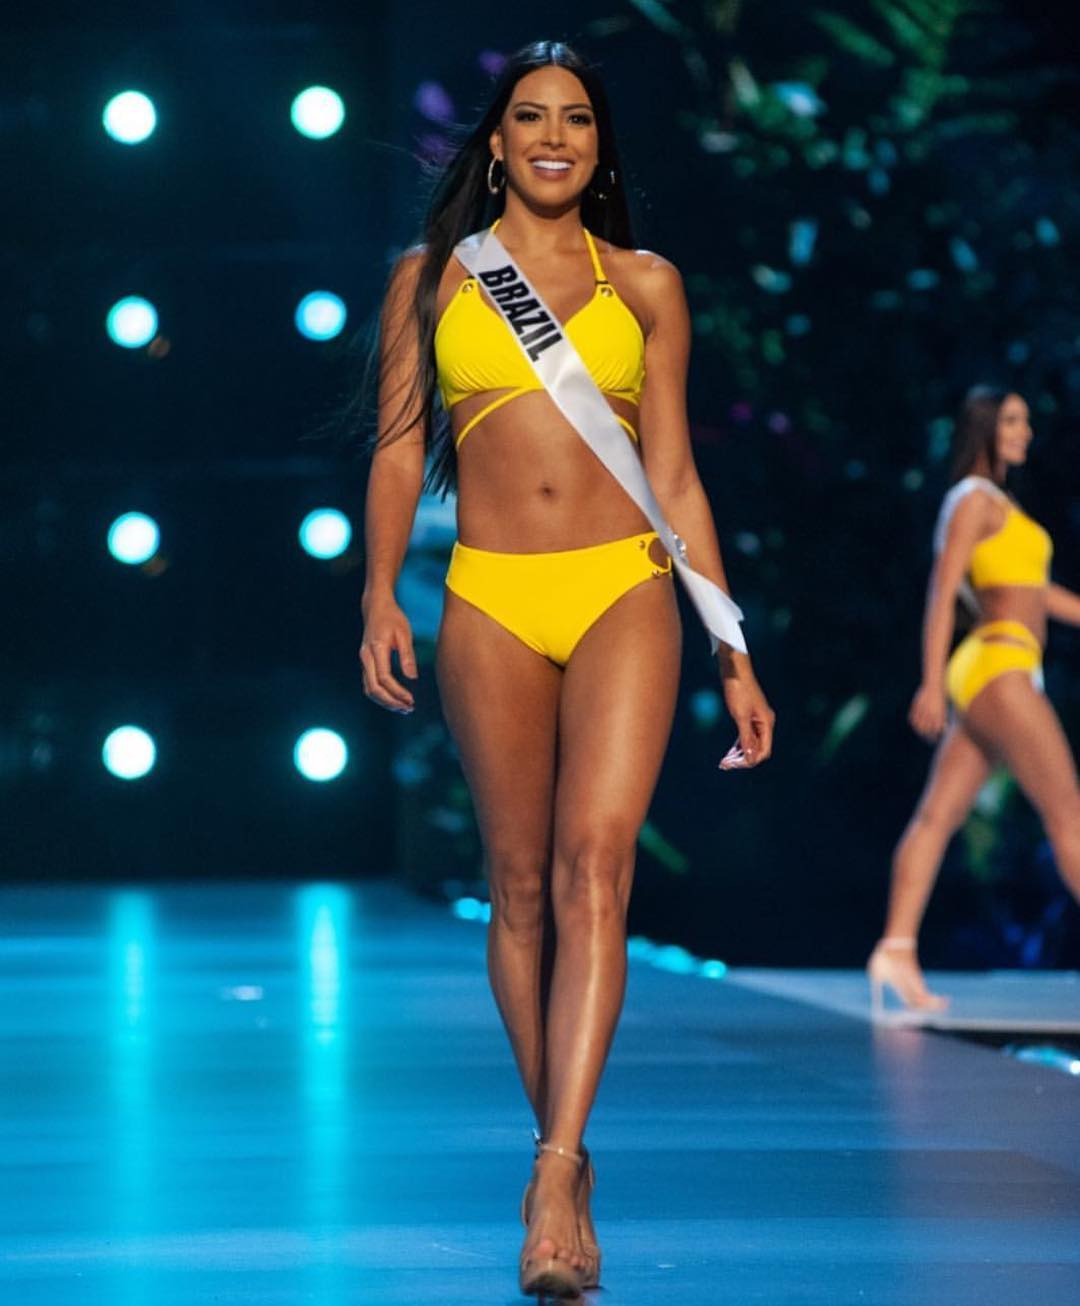 mayra dias, top 20 de miss universe 2018/primeira finalista de rainha hispanoamericana 2016. - Página 40 Aa22t210